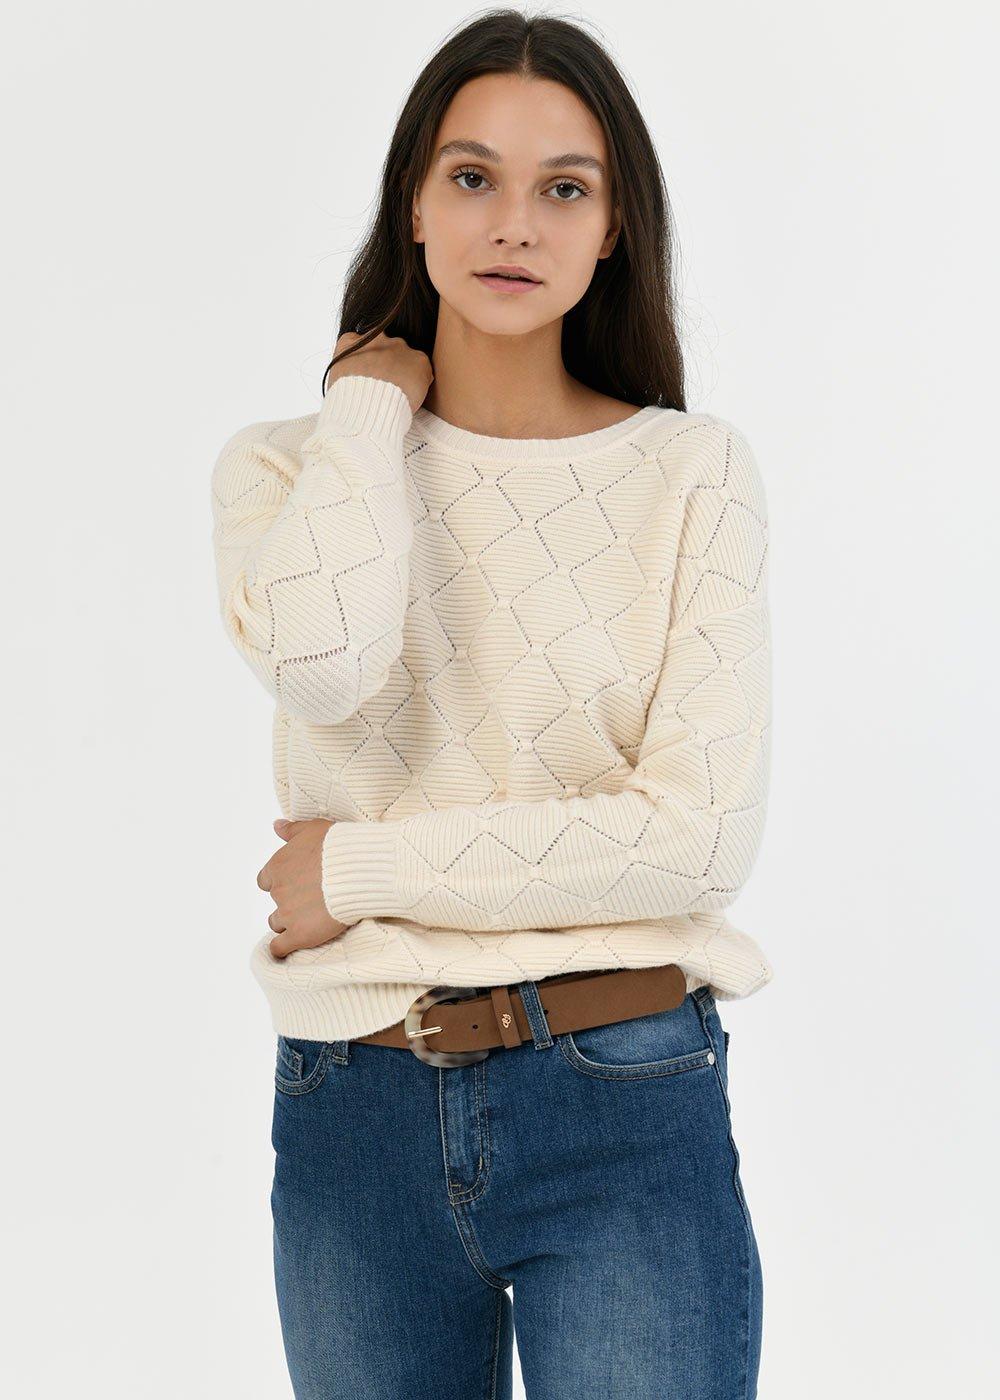 Mariel sweater with openwork stitch - Gauze White - Woman